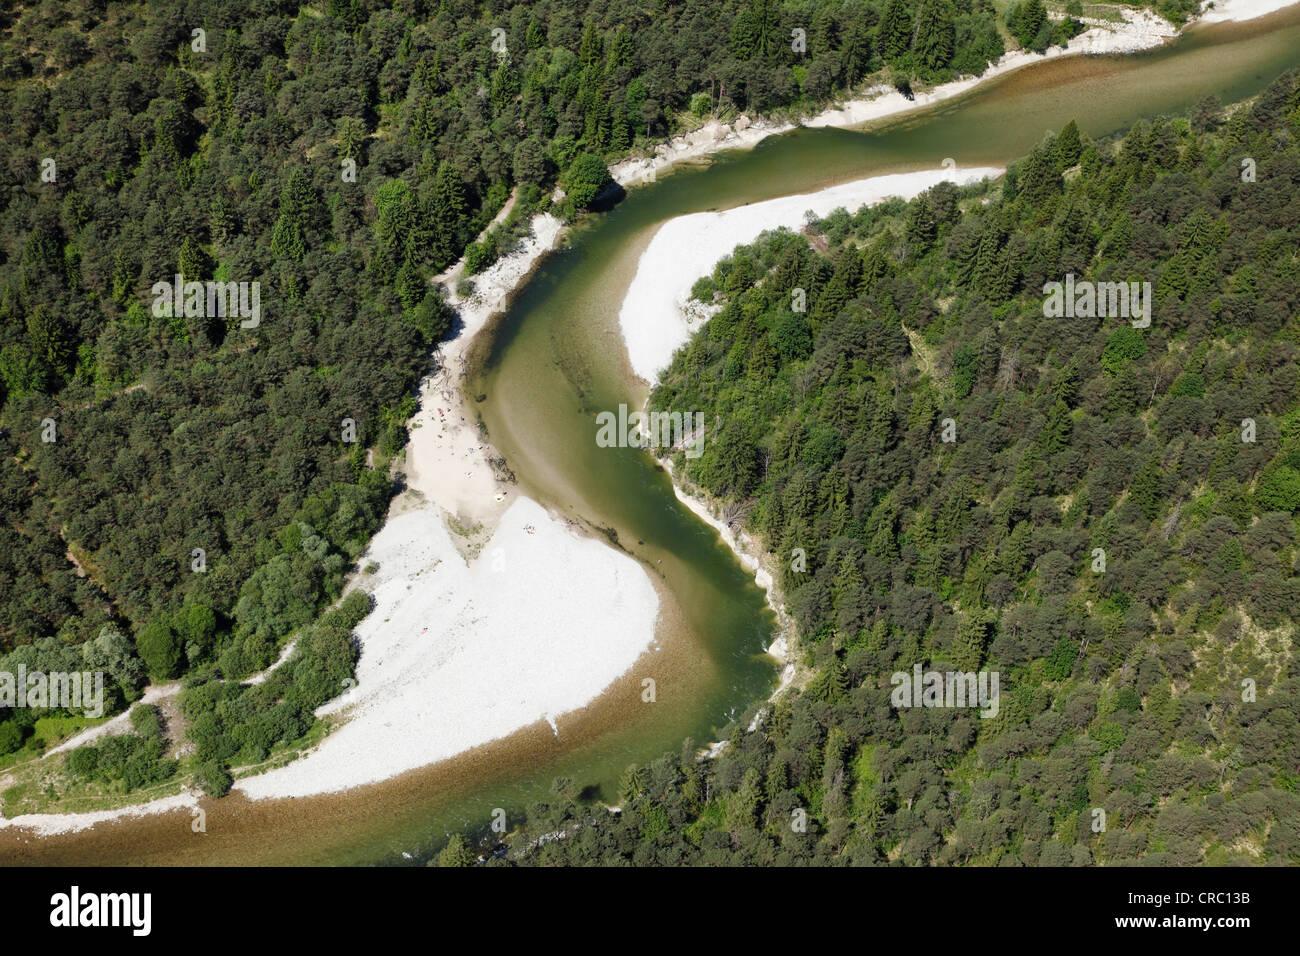 Aerial view, Isar river with Pupplinger Au, floodplains, near Wolfratshausen, Upper Bavaria, Bavaria, Germany, Europe - Stock Image